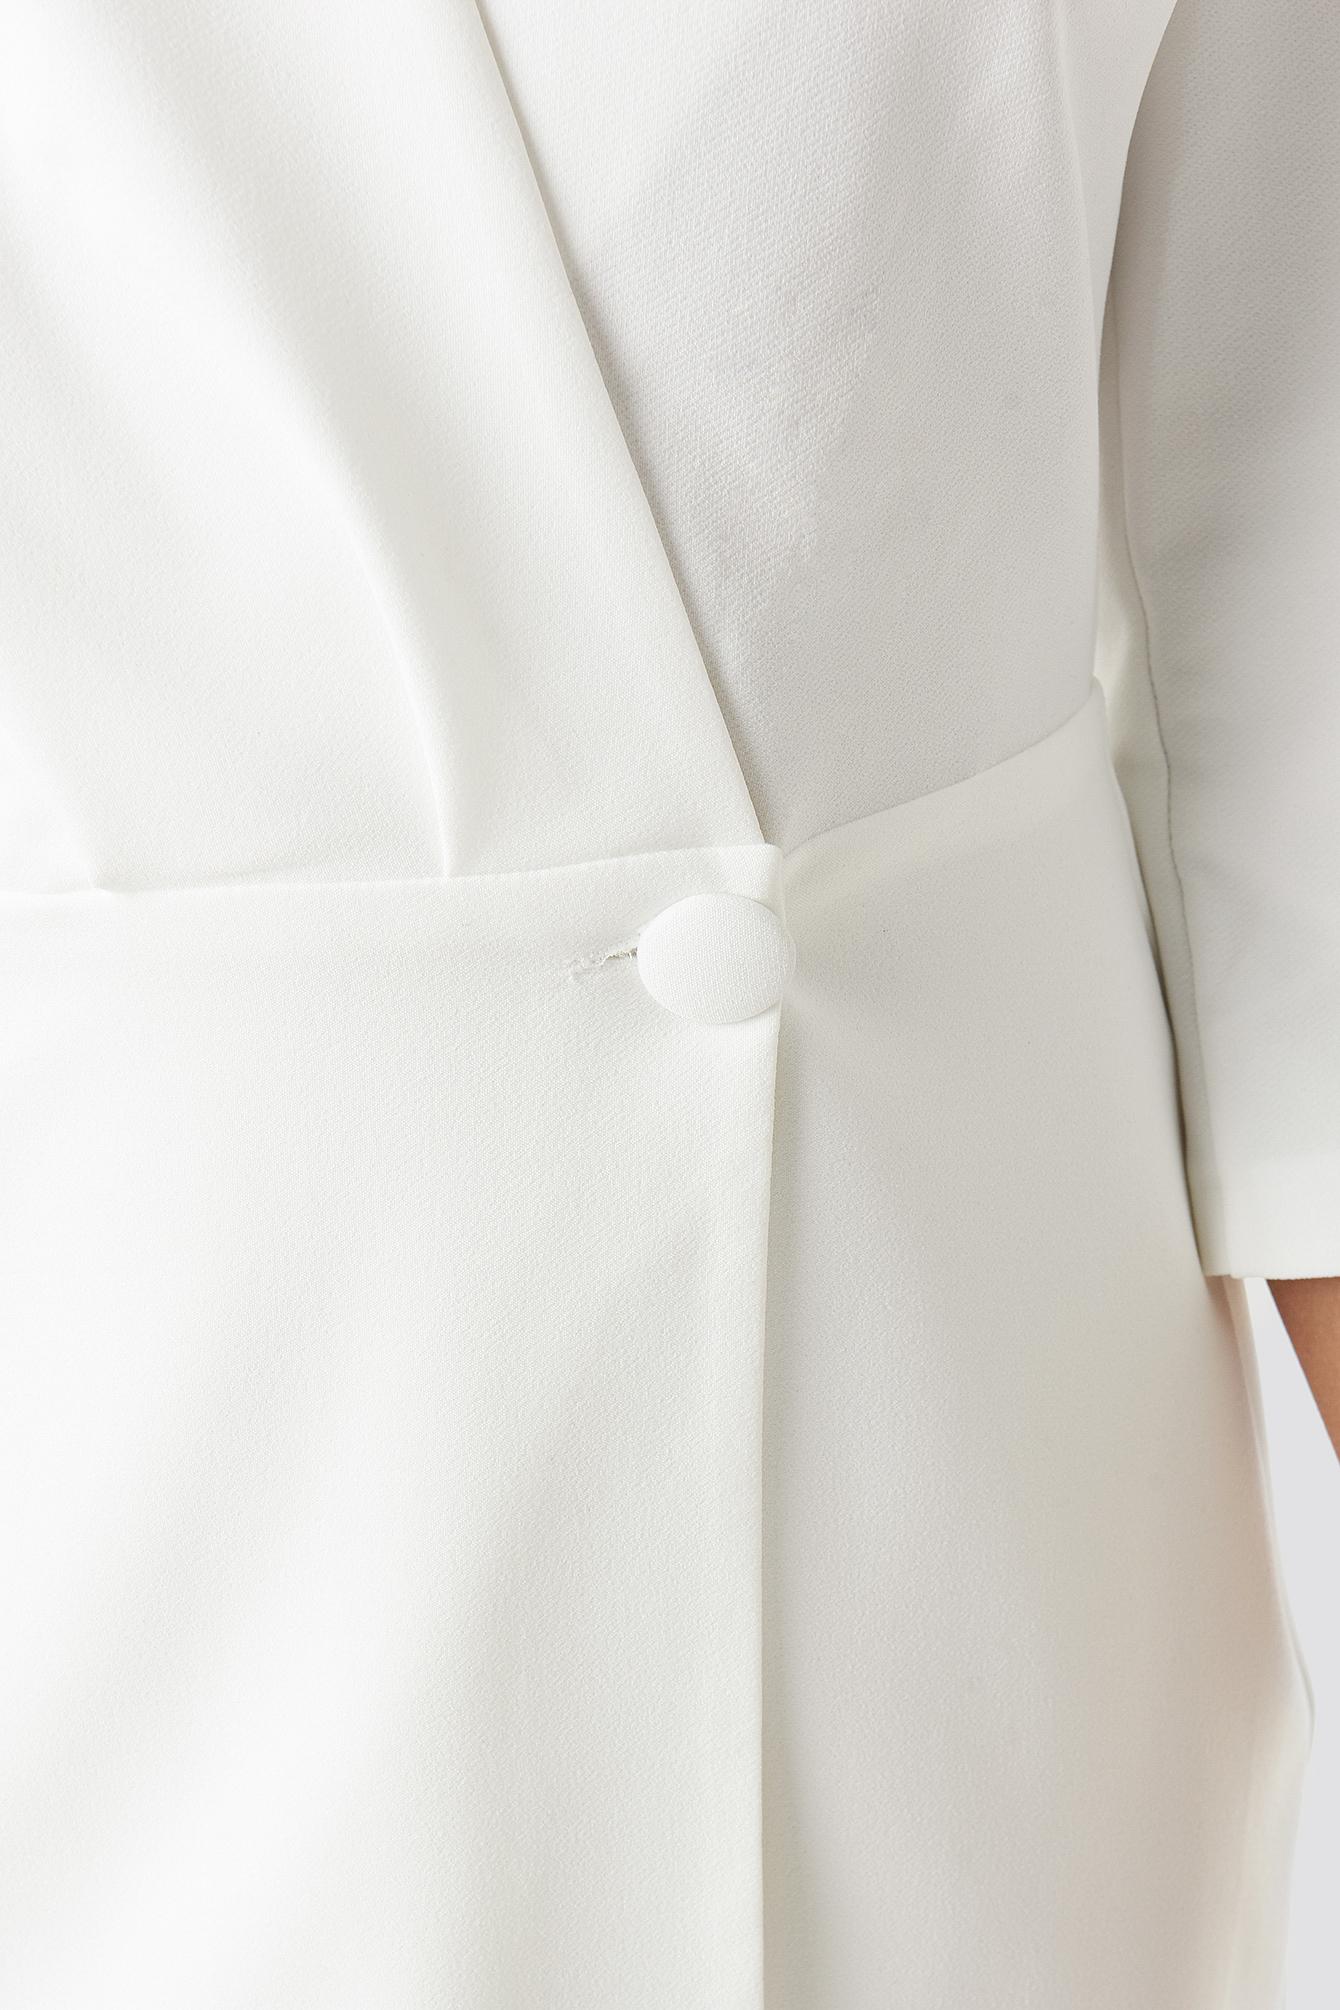 Milla Button Detailed Dress NA-KD.COM